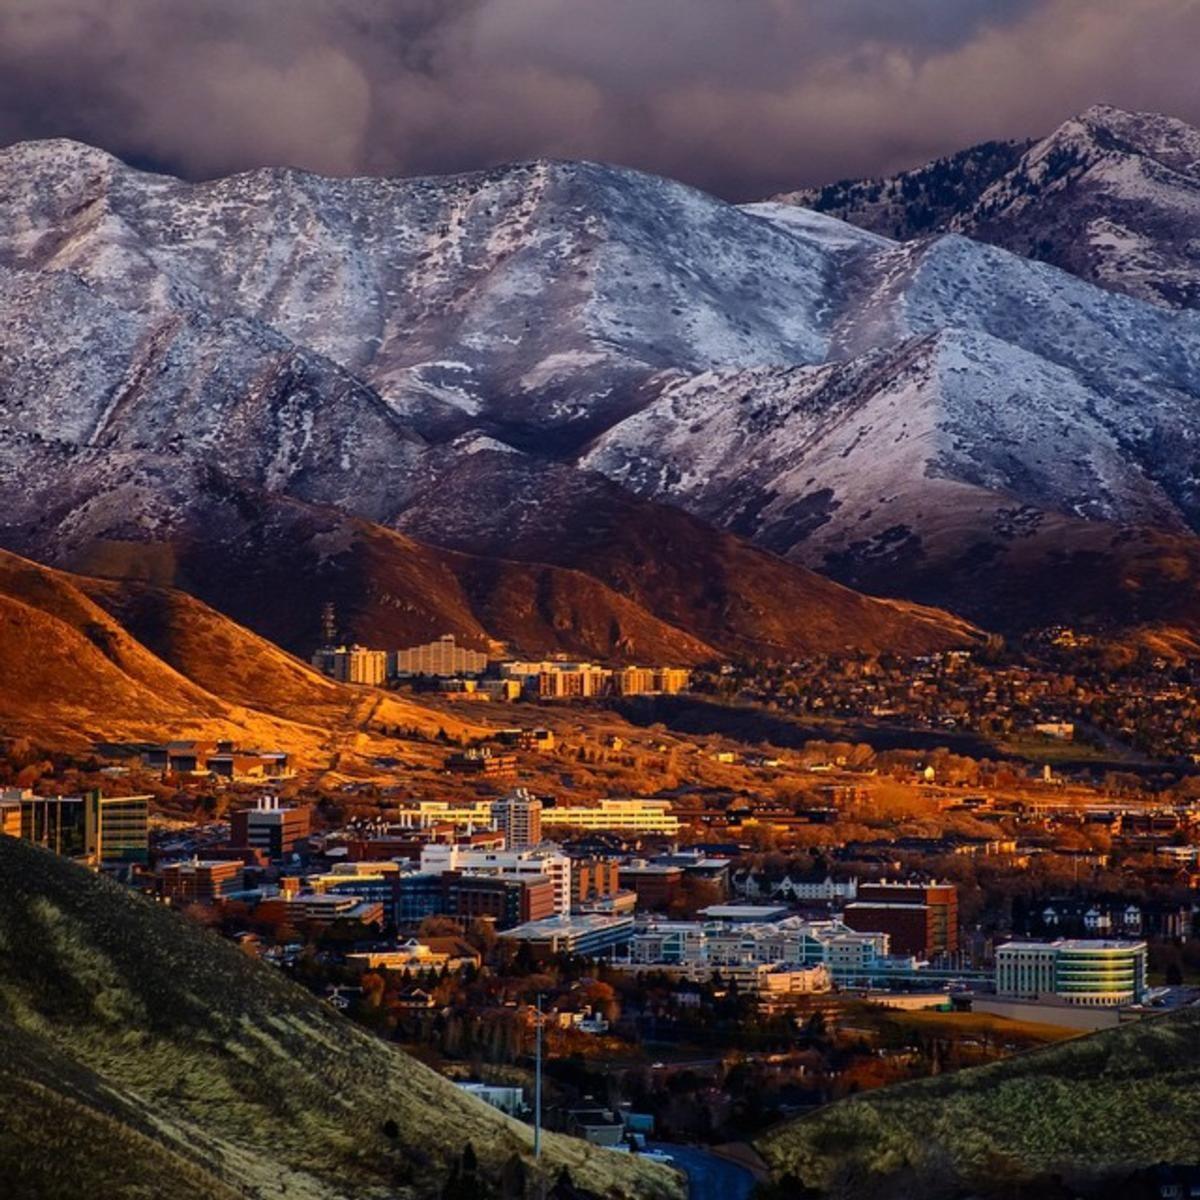 Salt Lake City Utah Homes: Salt Lake City Photos I've Seen The City Look Like